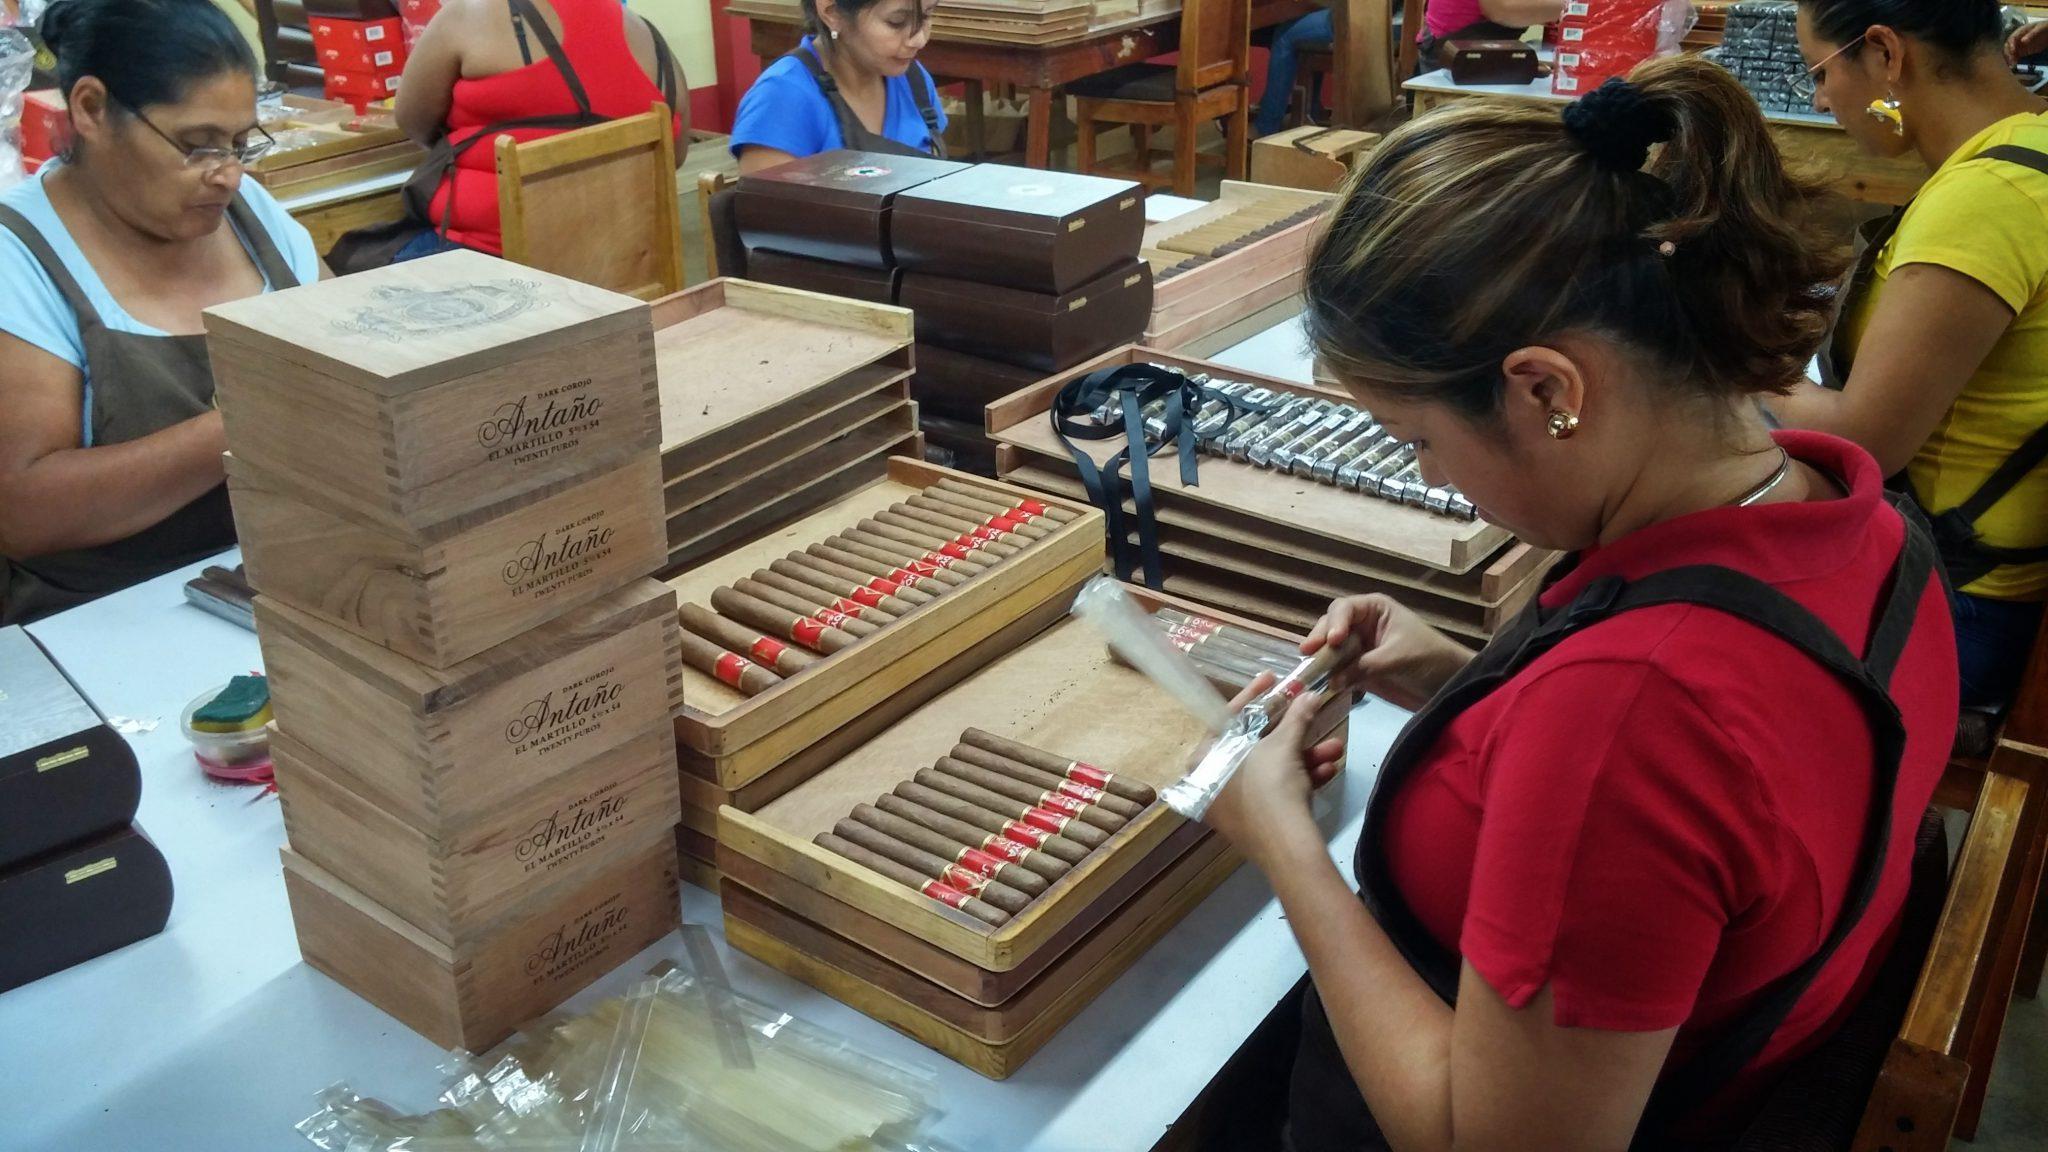 joya de nicaragua cigars guide jdn joya cigar bands at JdN factory